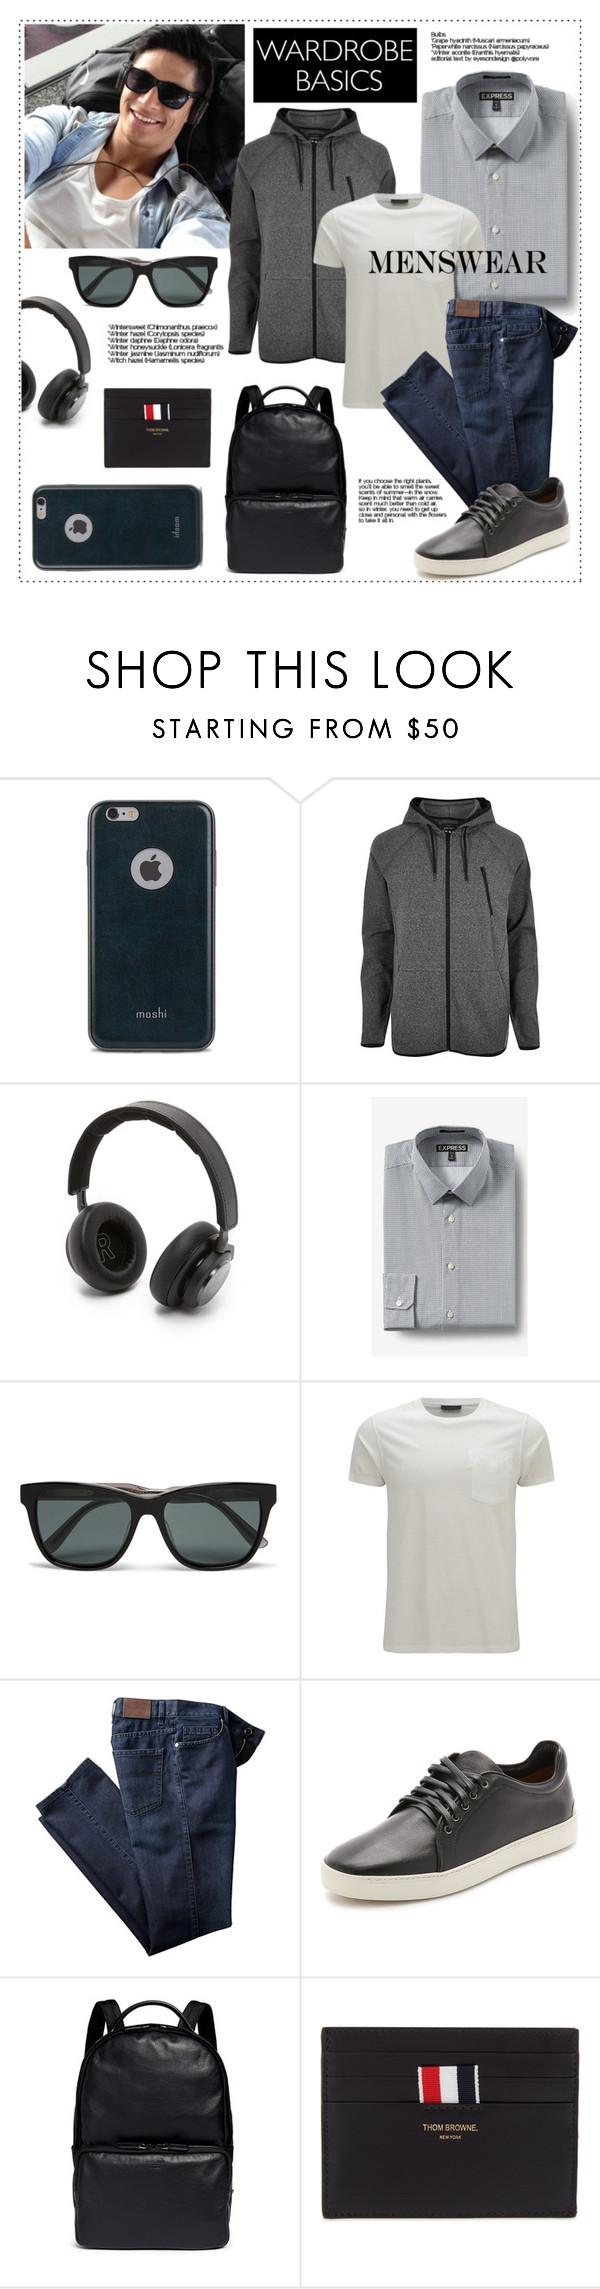 """Menswear: Wardrobe Basics"" by pat912 ❤ liked on Polyvore featuring Moshi, River Island, B&O Play, Express, Bottega Veneta, Belstaff, rag & bone, Giorgio Armani, Thom Browne and mens"